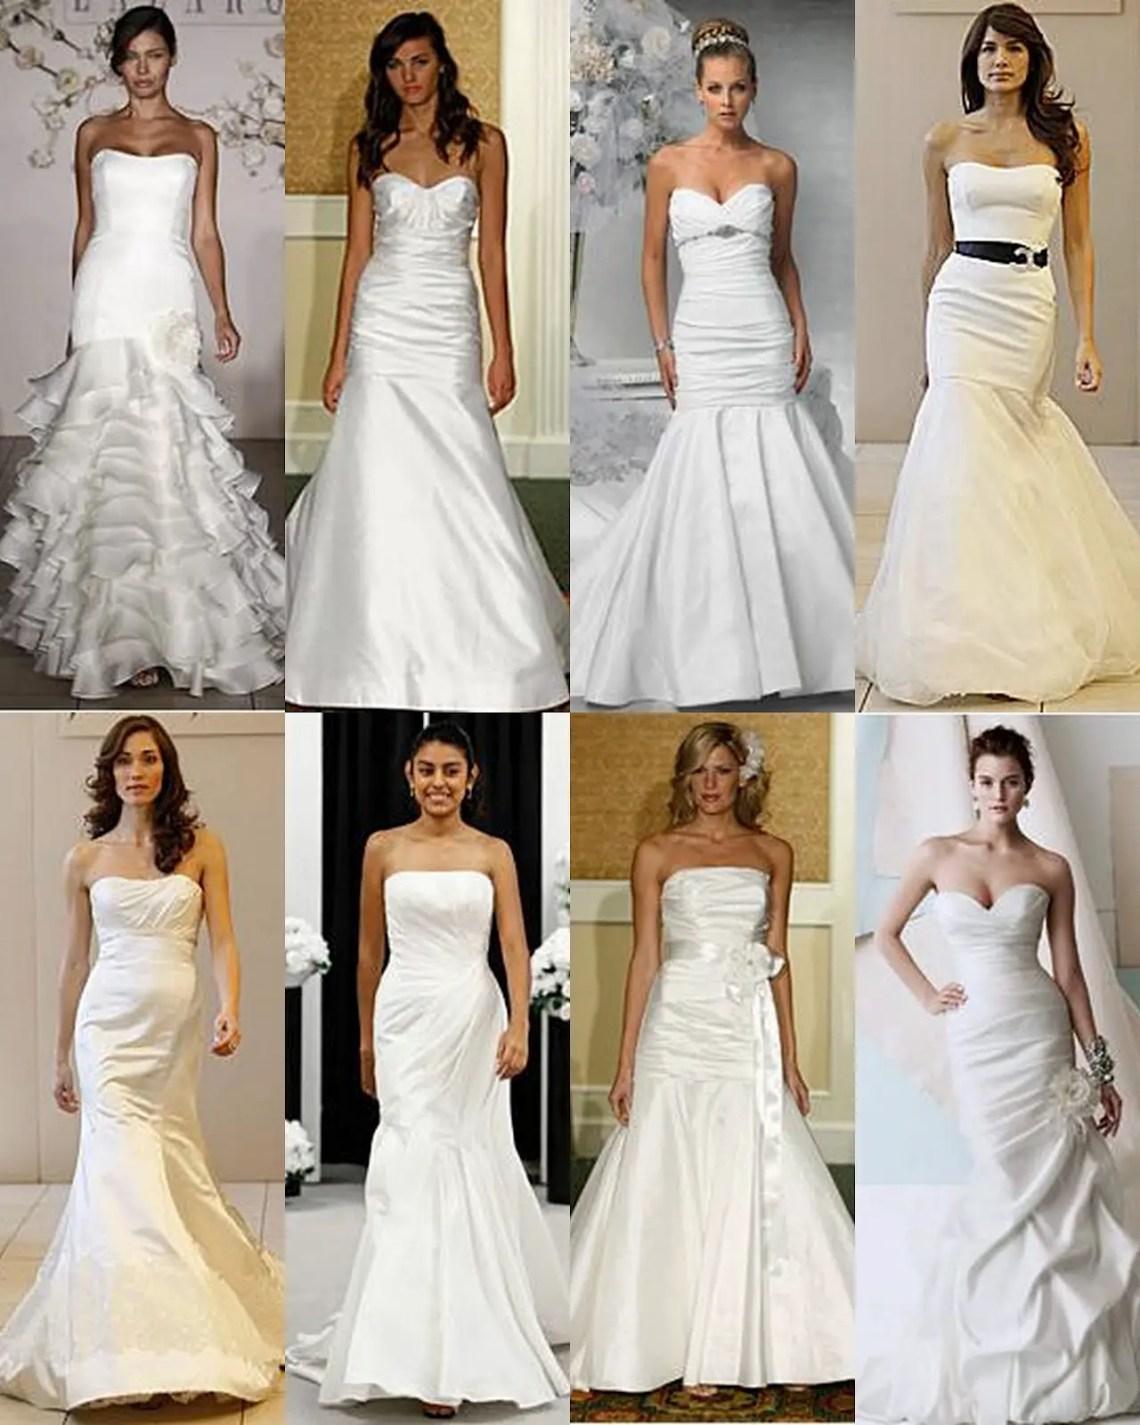 Types Of Wedding Dresses | Types Of